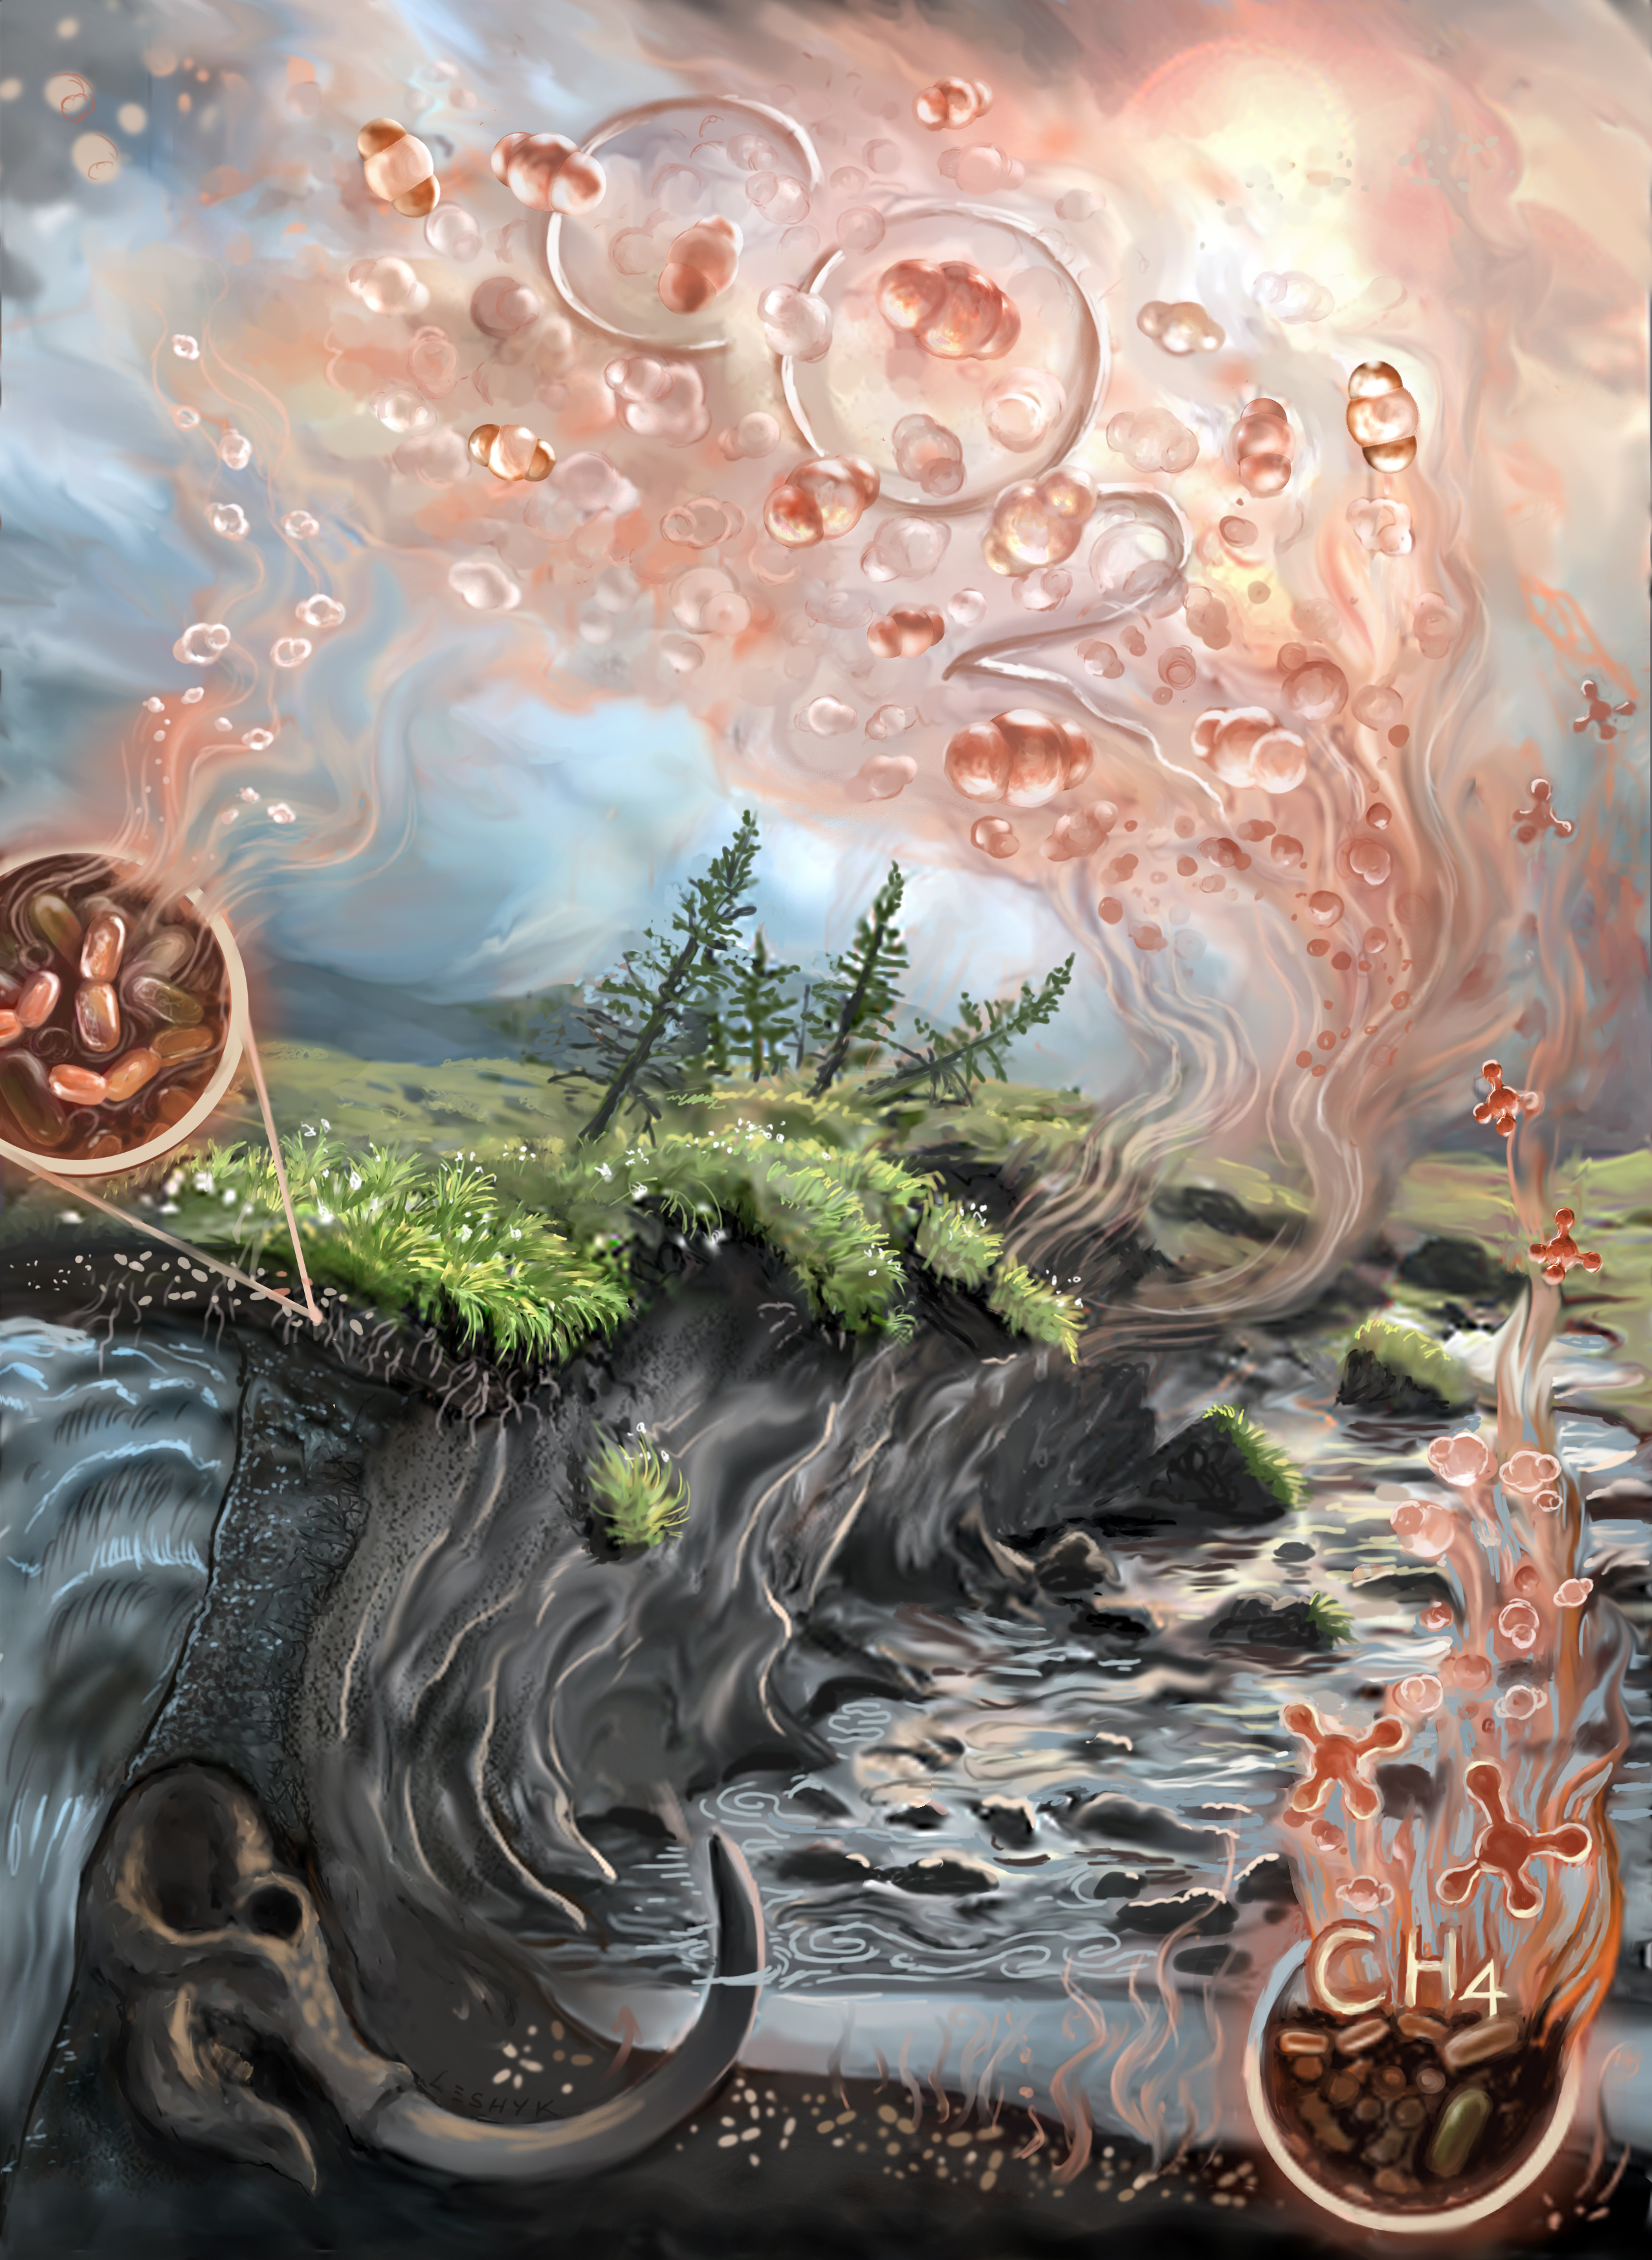 leshyk illustration thawing permafrost